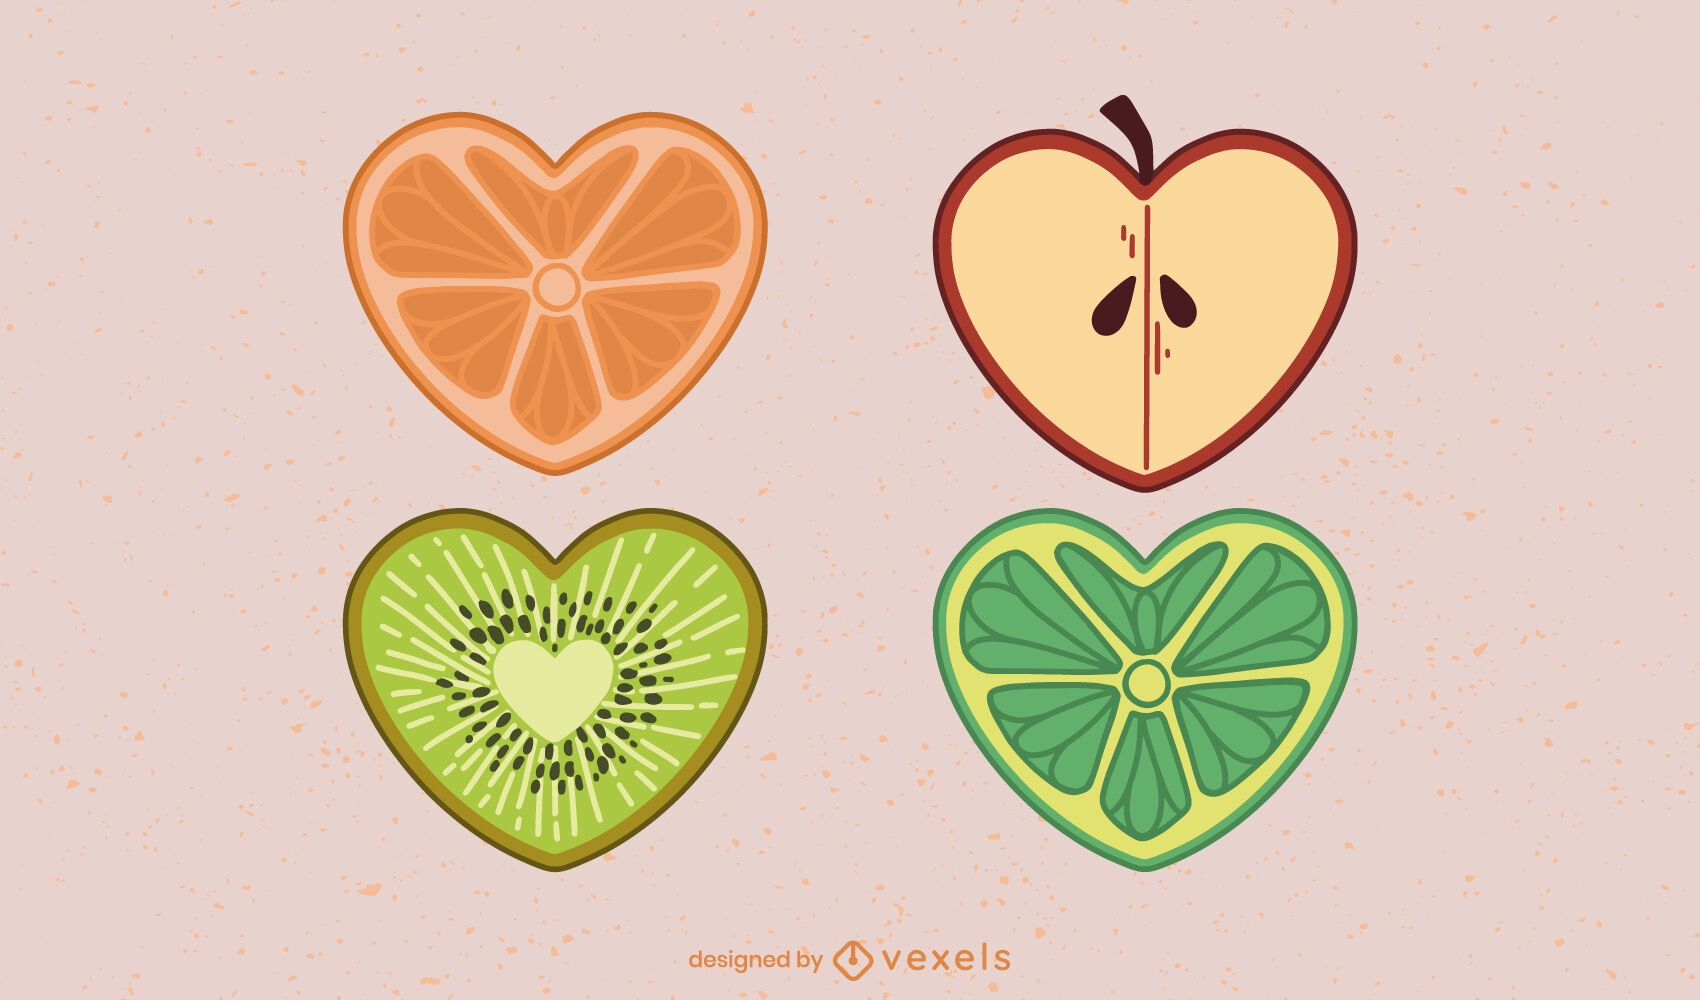 Heart shaped fruit set